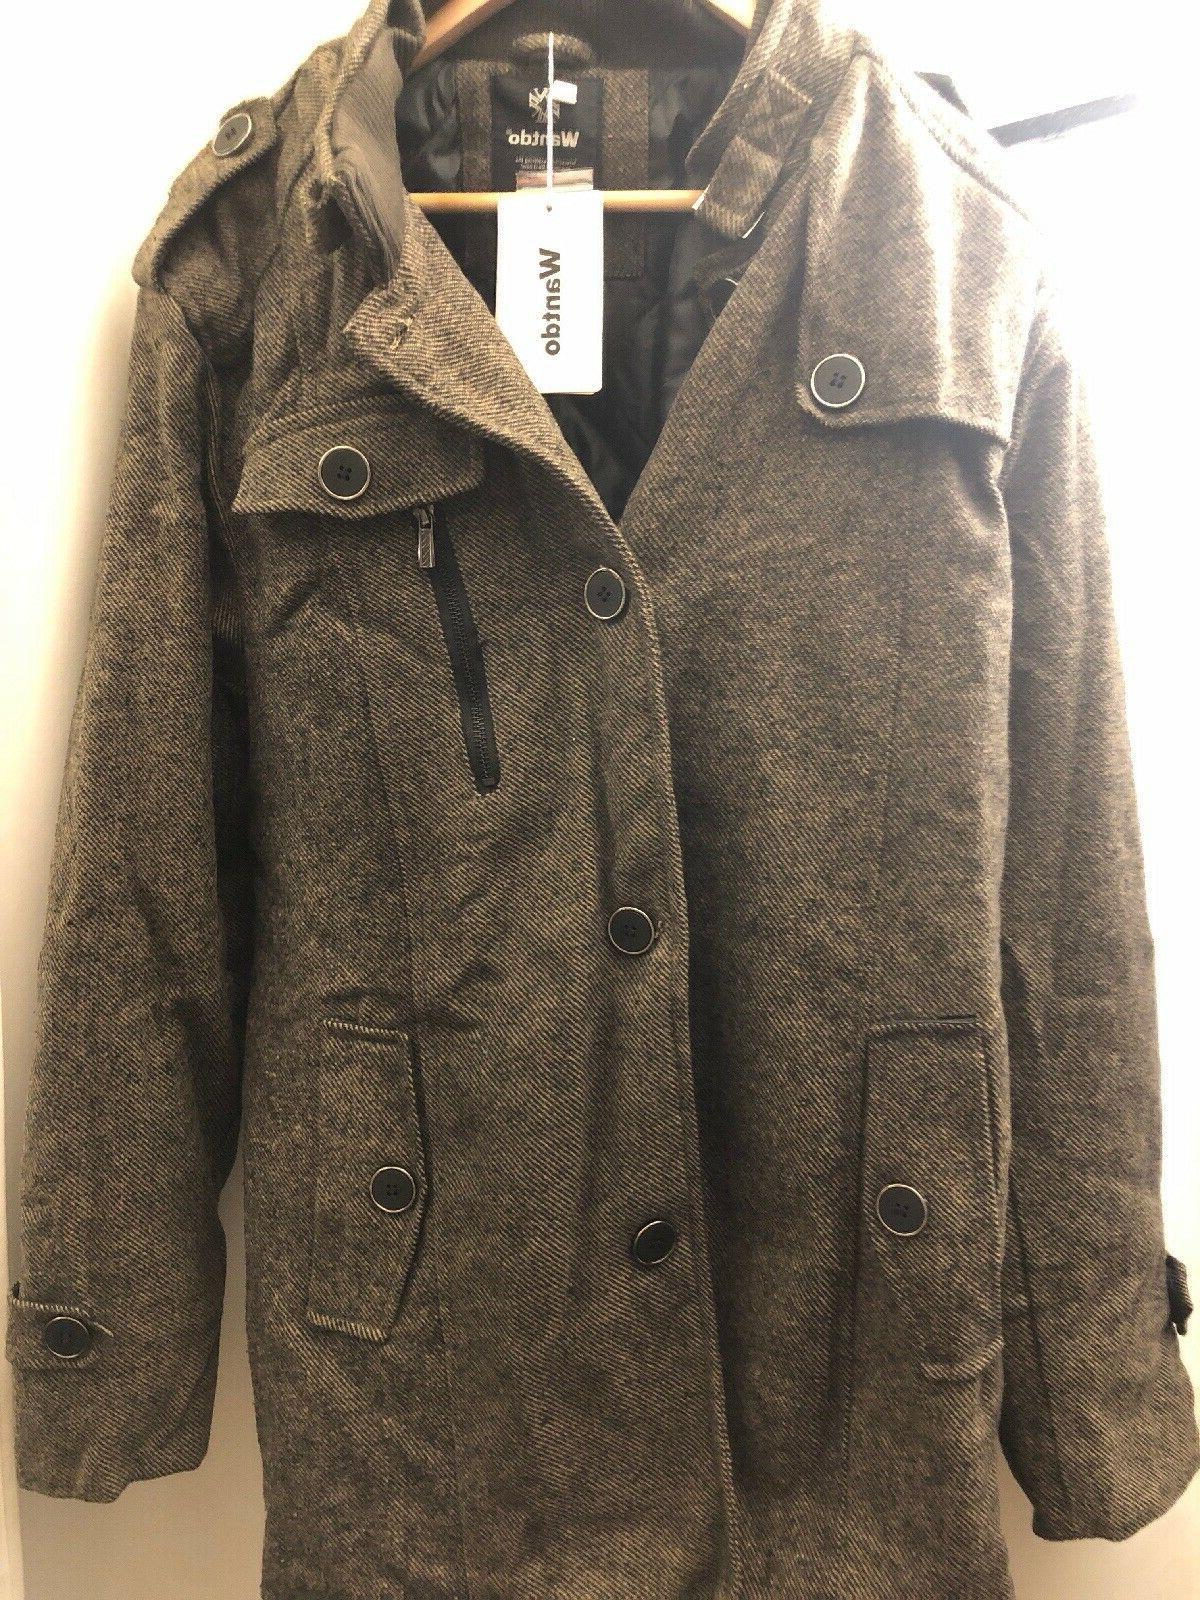 wool blend single breasted military peacoat jacket